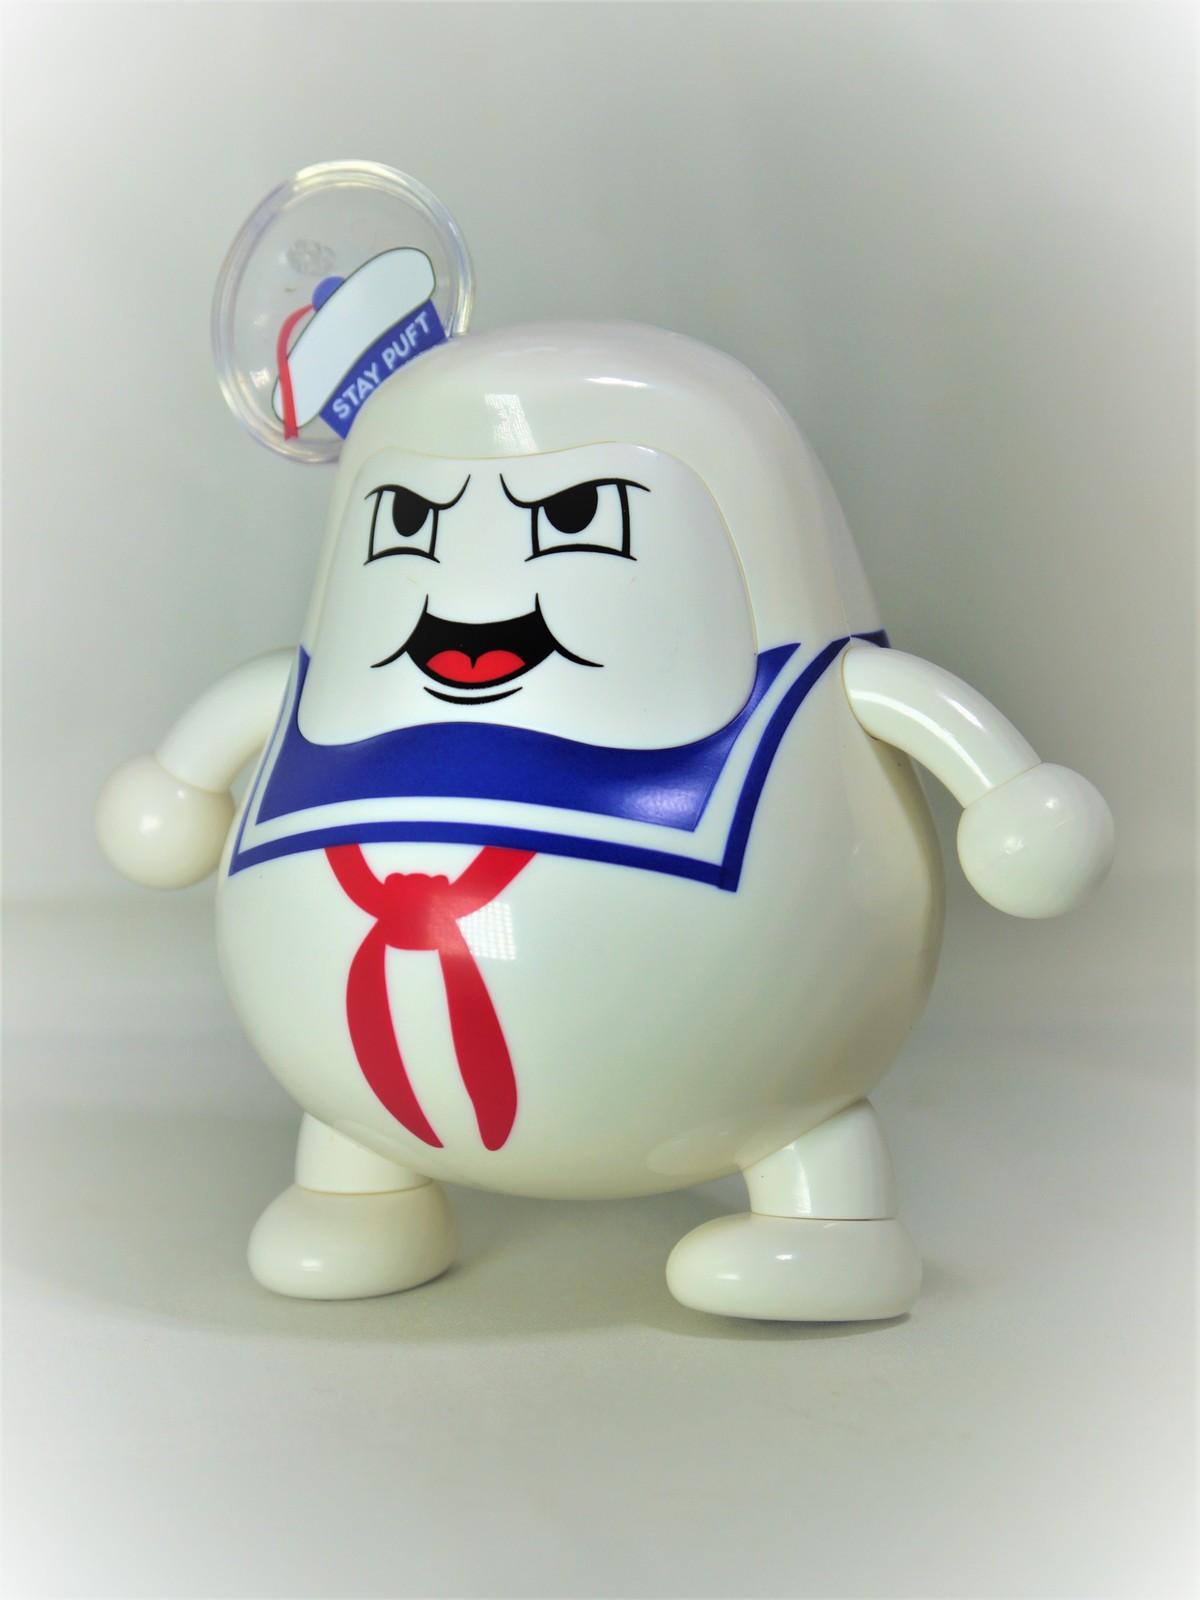 Bandai daruma club ghostbusters marshmallow man 03